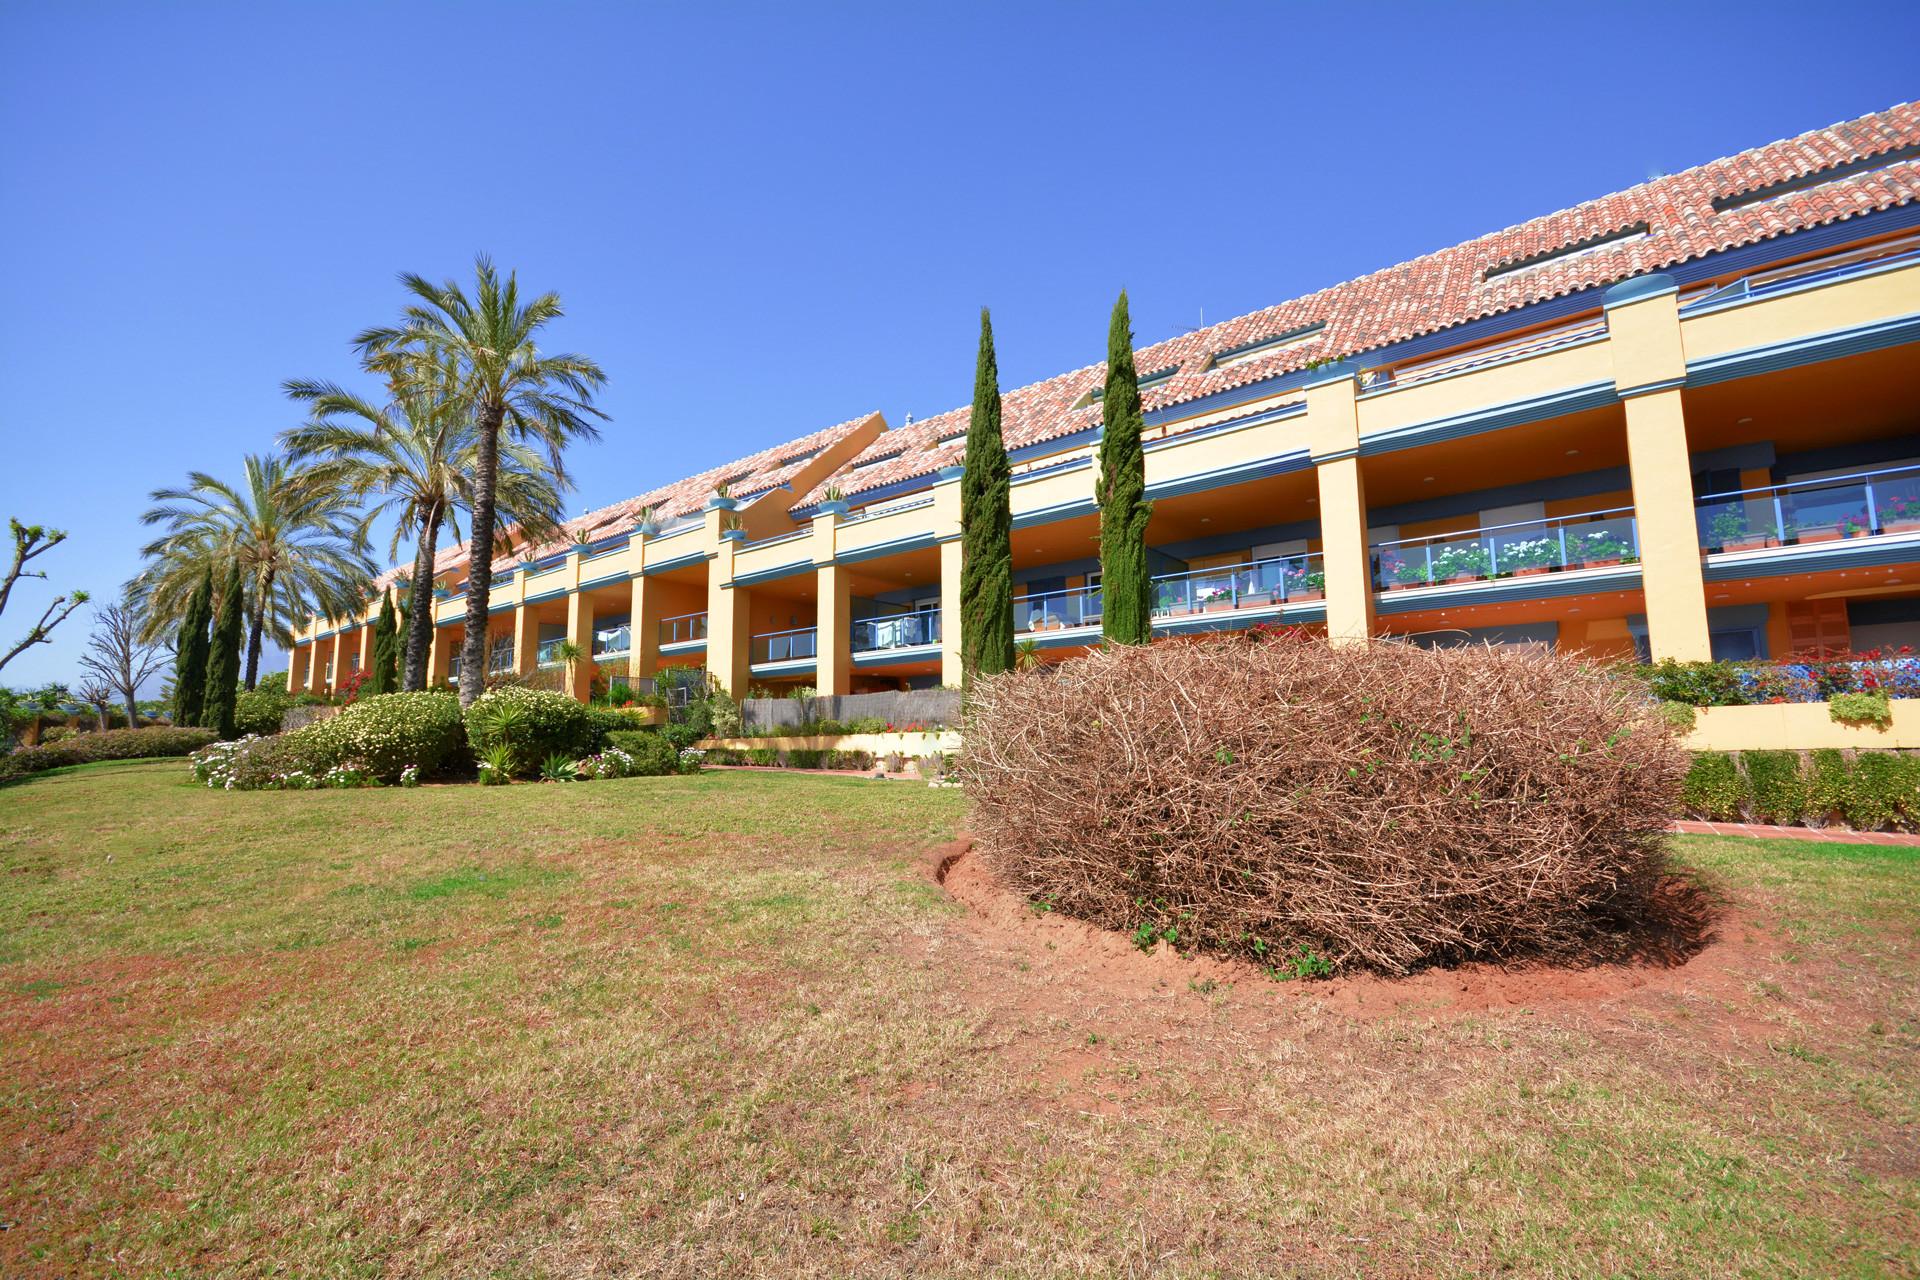 Ground floor apartment for sale beachside in Bahia de Marbella